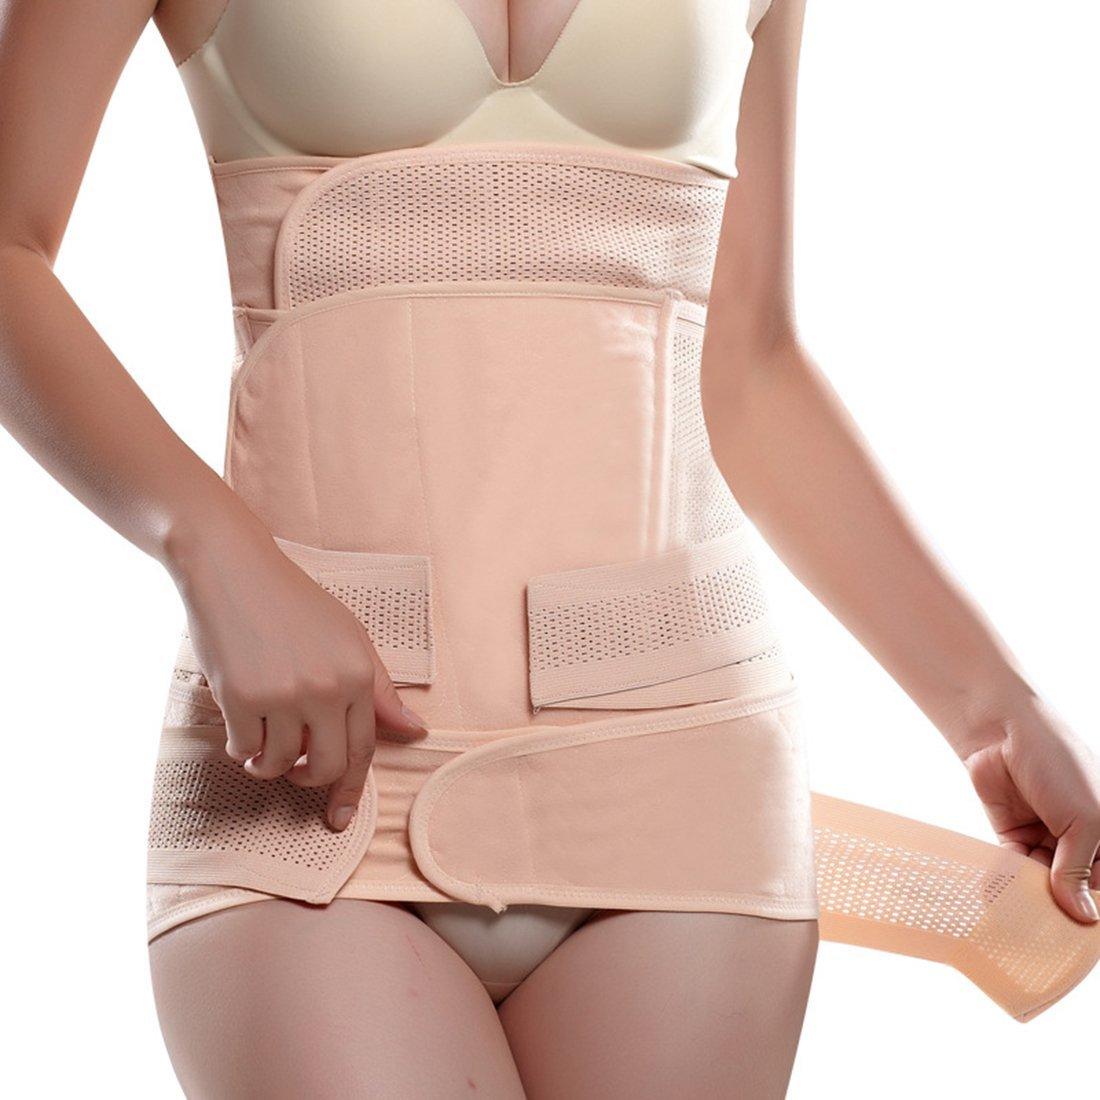 bd85a3e1afd Get Quotations · Women s Elastic Breathable Ventilation Postpartum  Postnatal Pregnancy Belt for Hips Waist Slimming Shaper Wrapper Abdomen  Support